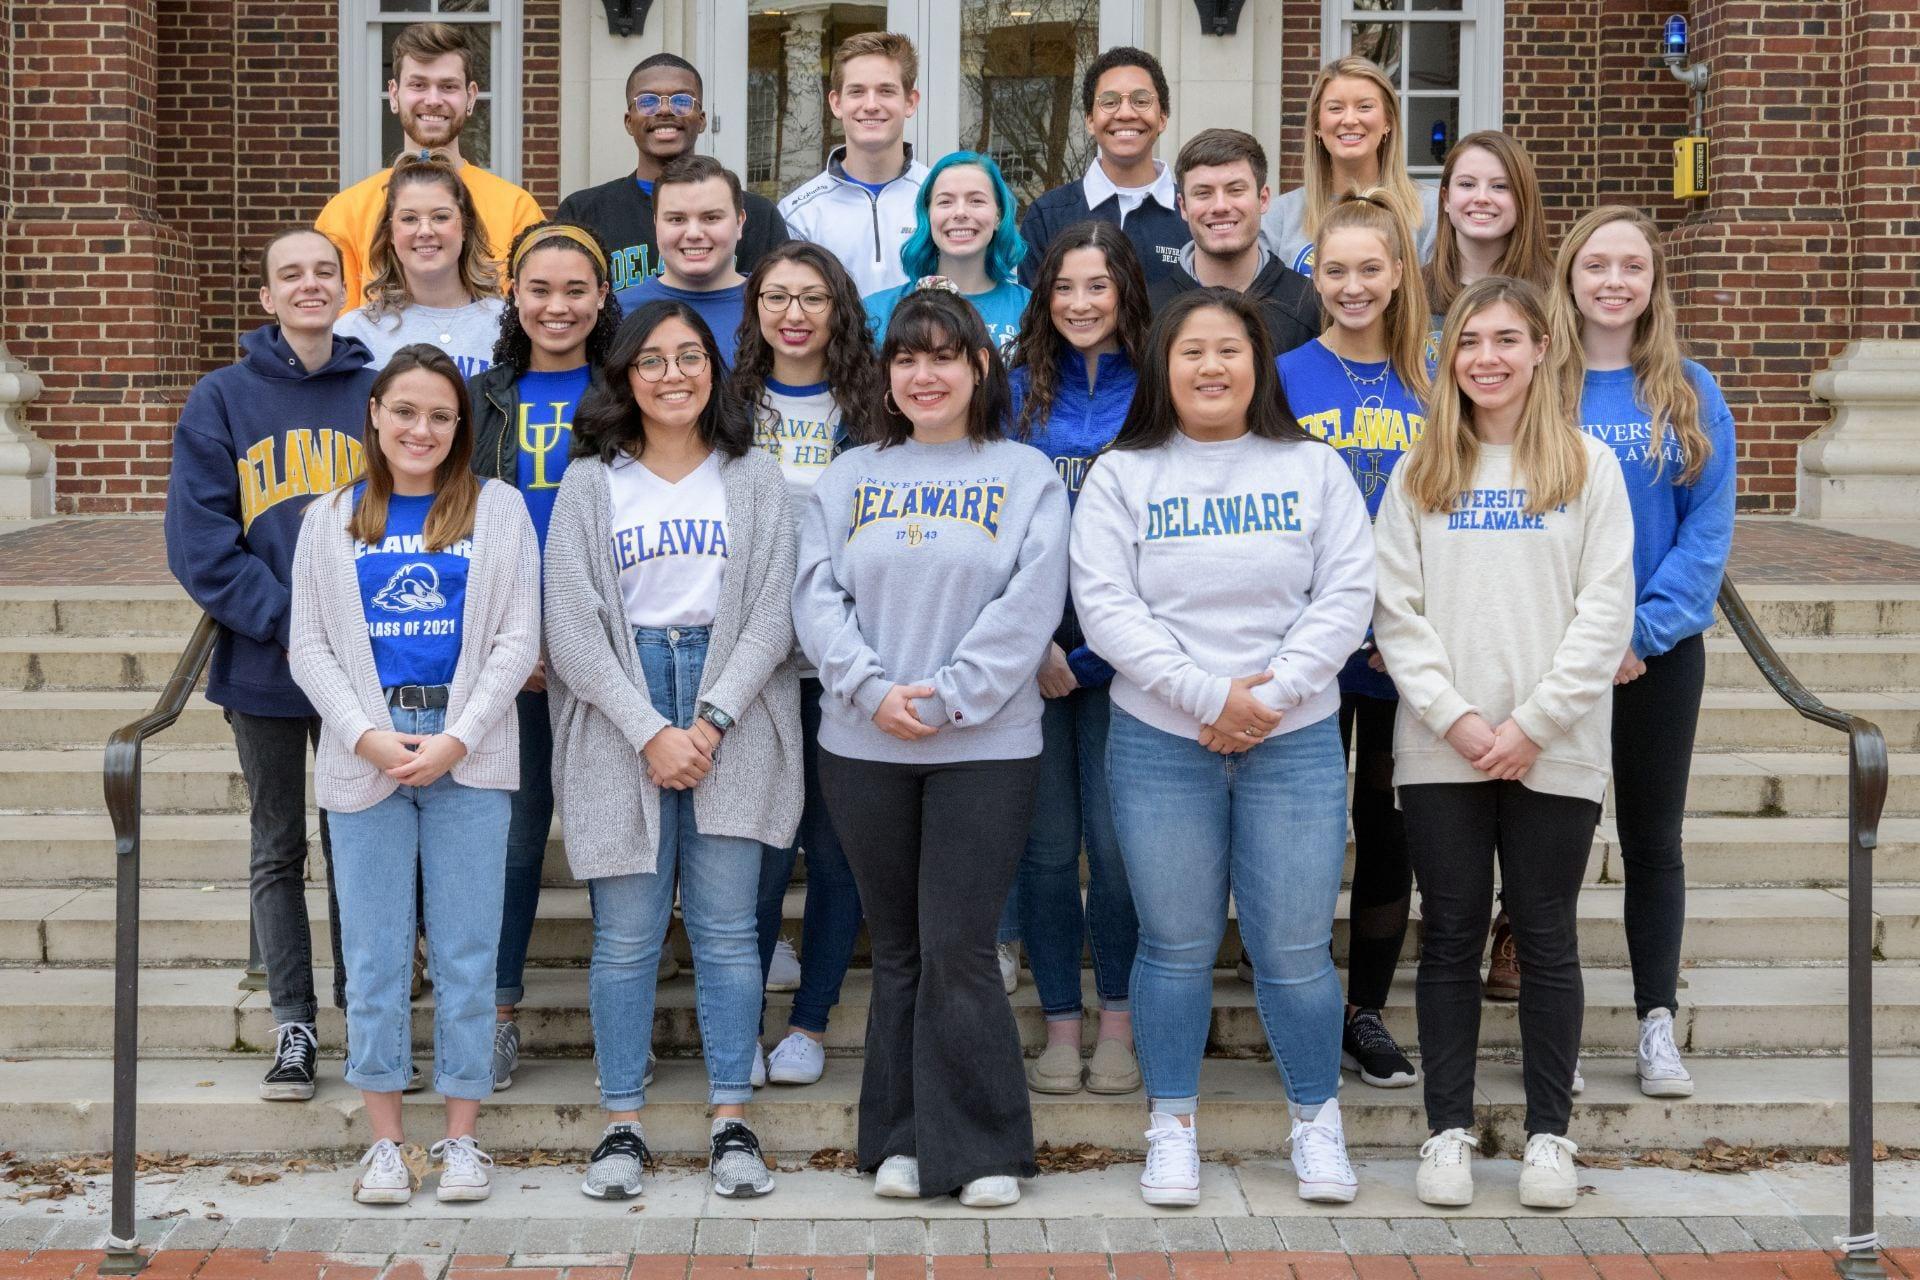 University Of Delaware 2021 Calendar Orientation & Transition Programs   UD Division of Student Life  